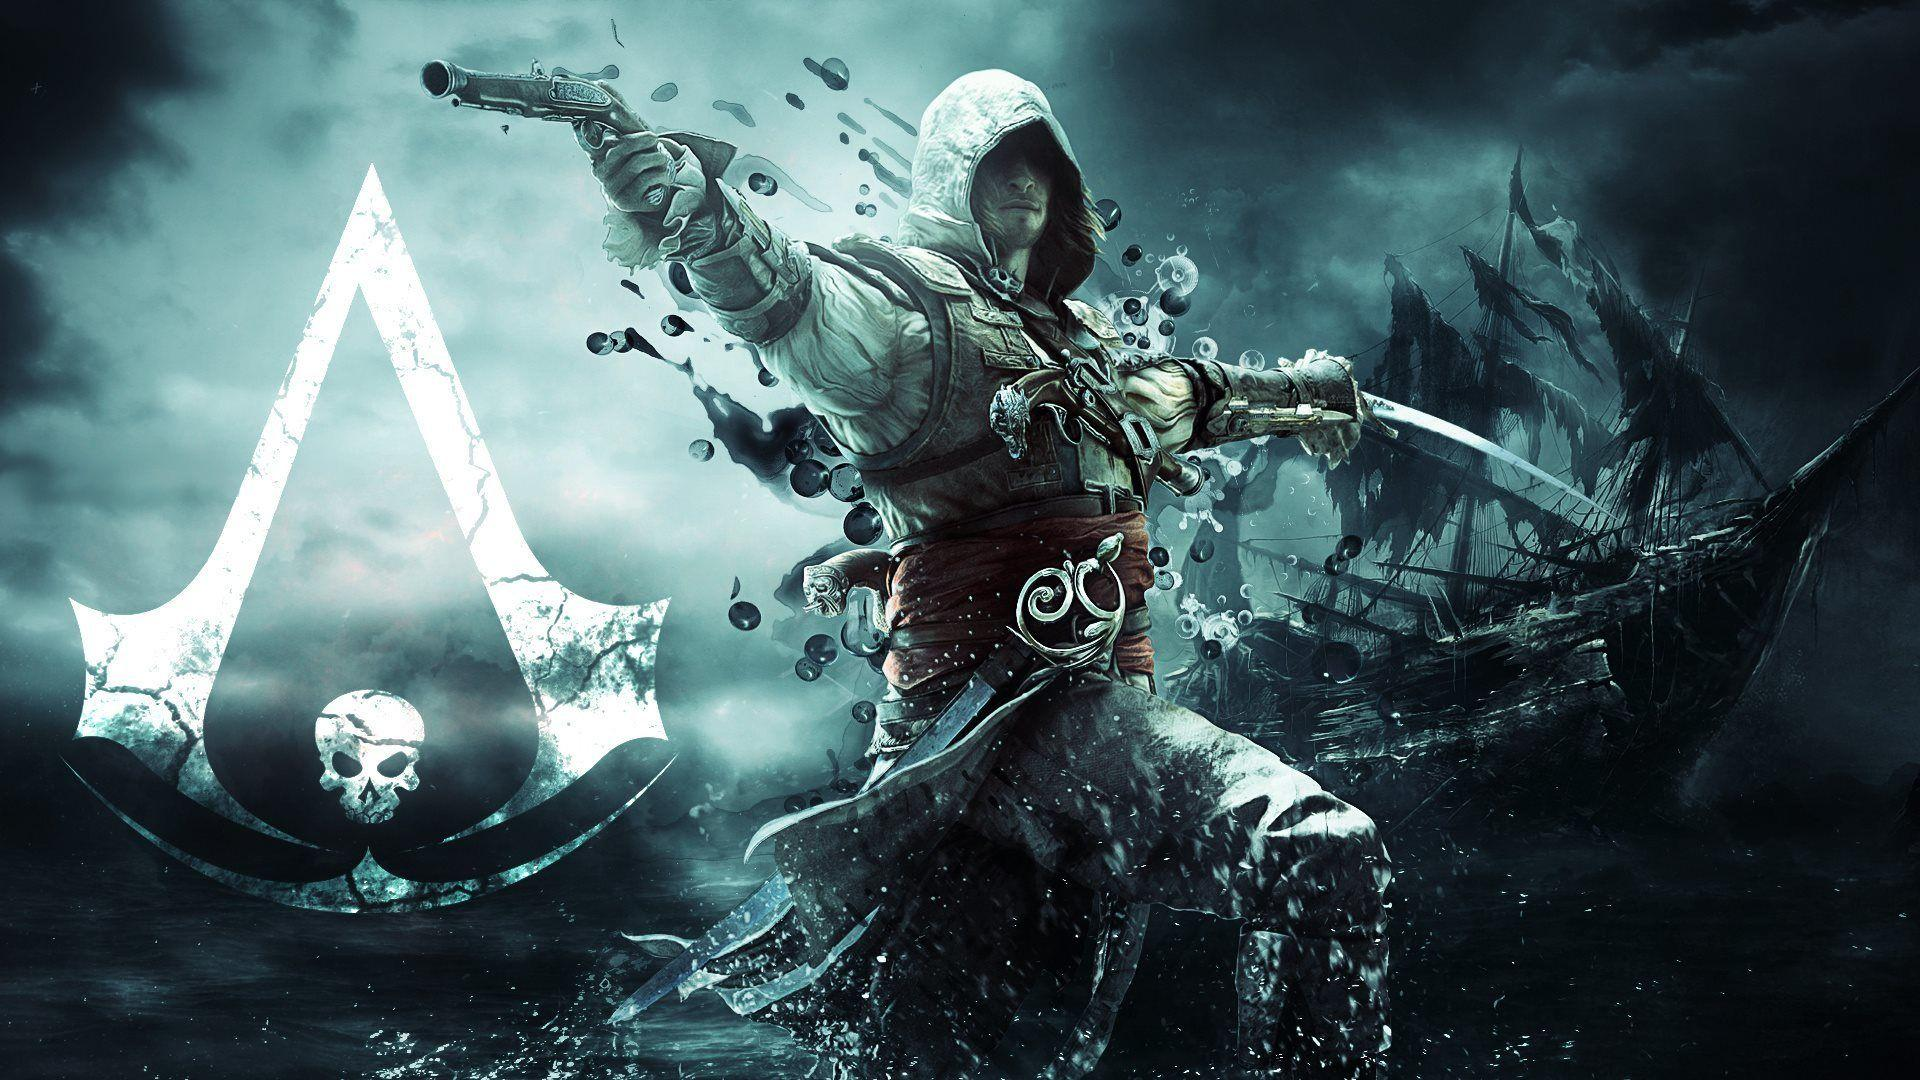 Full HD Wallpaper Assassins Creed Edward Kenway Logo Ship Desktop